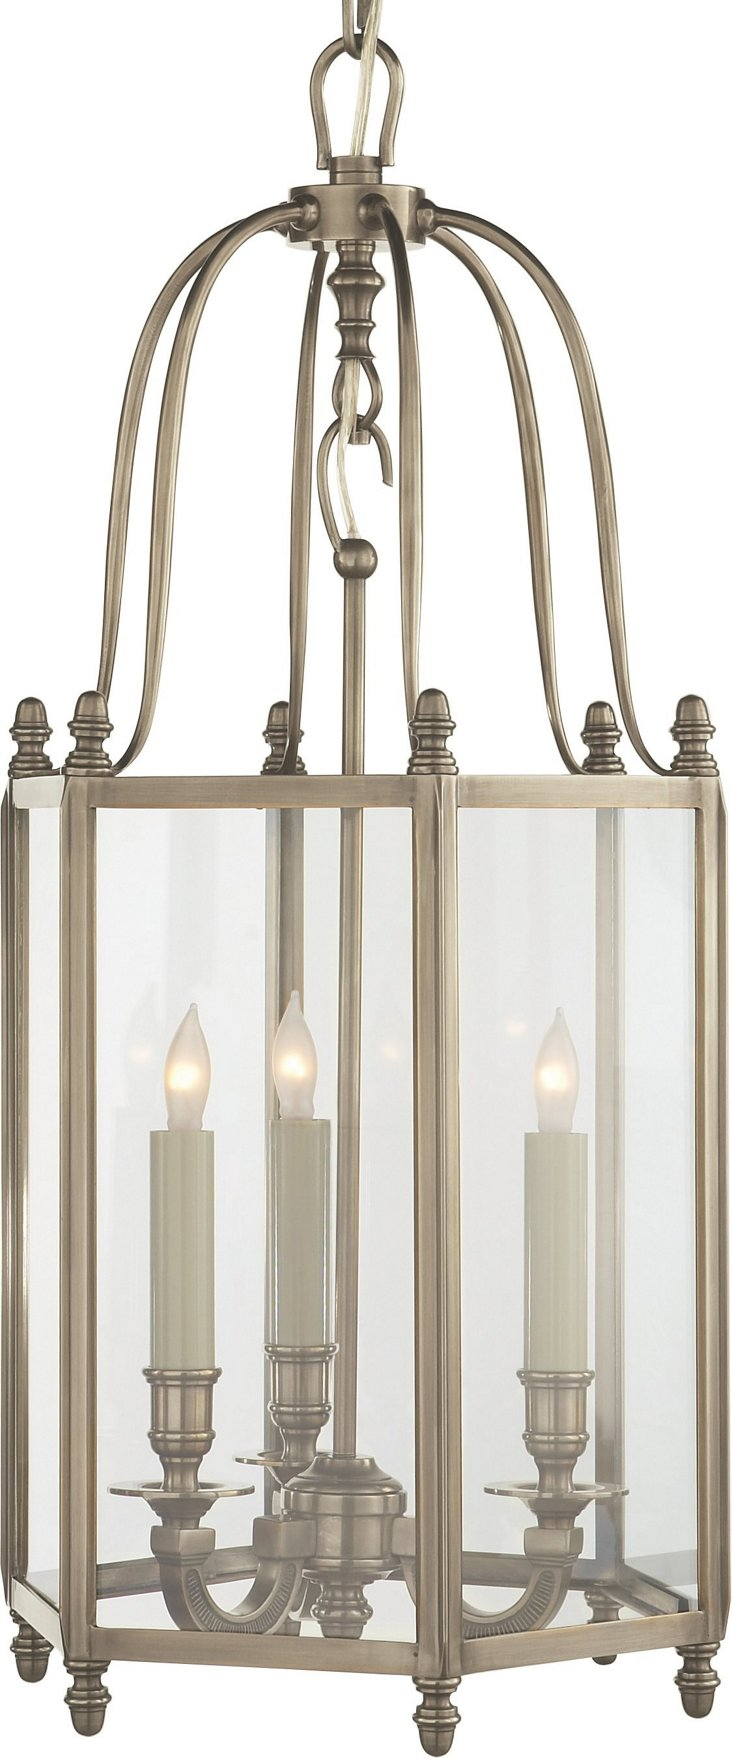 English 3-Light Hall Lantern, Nickel